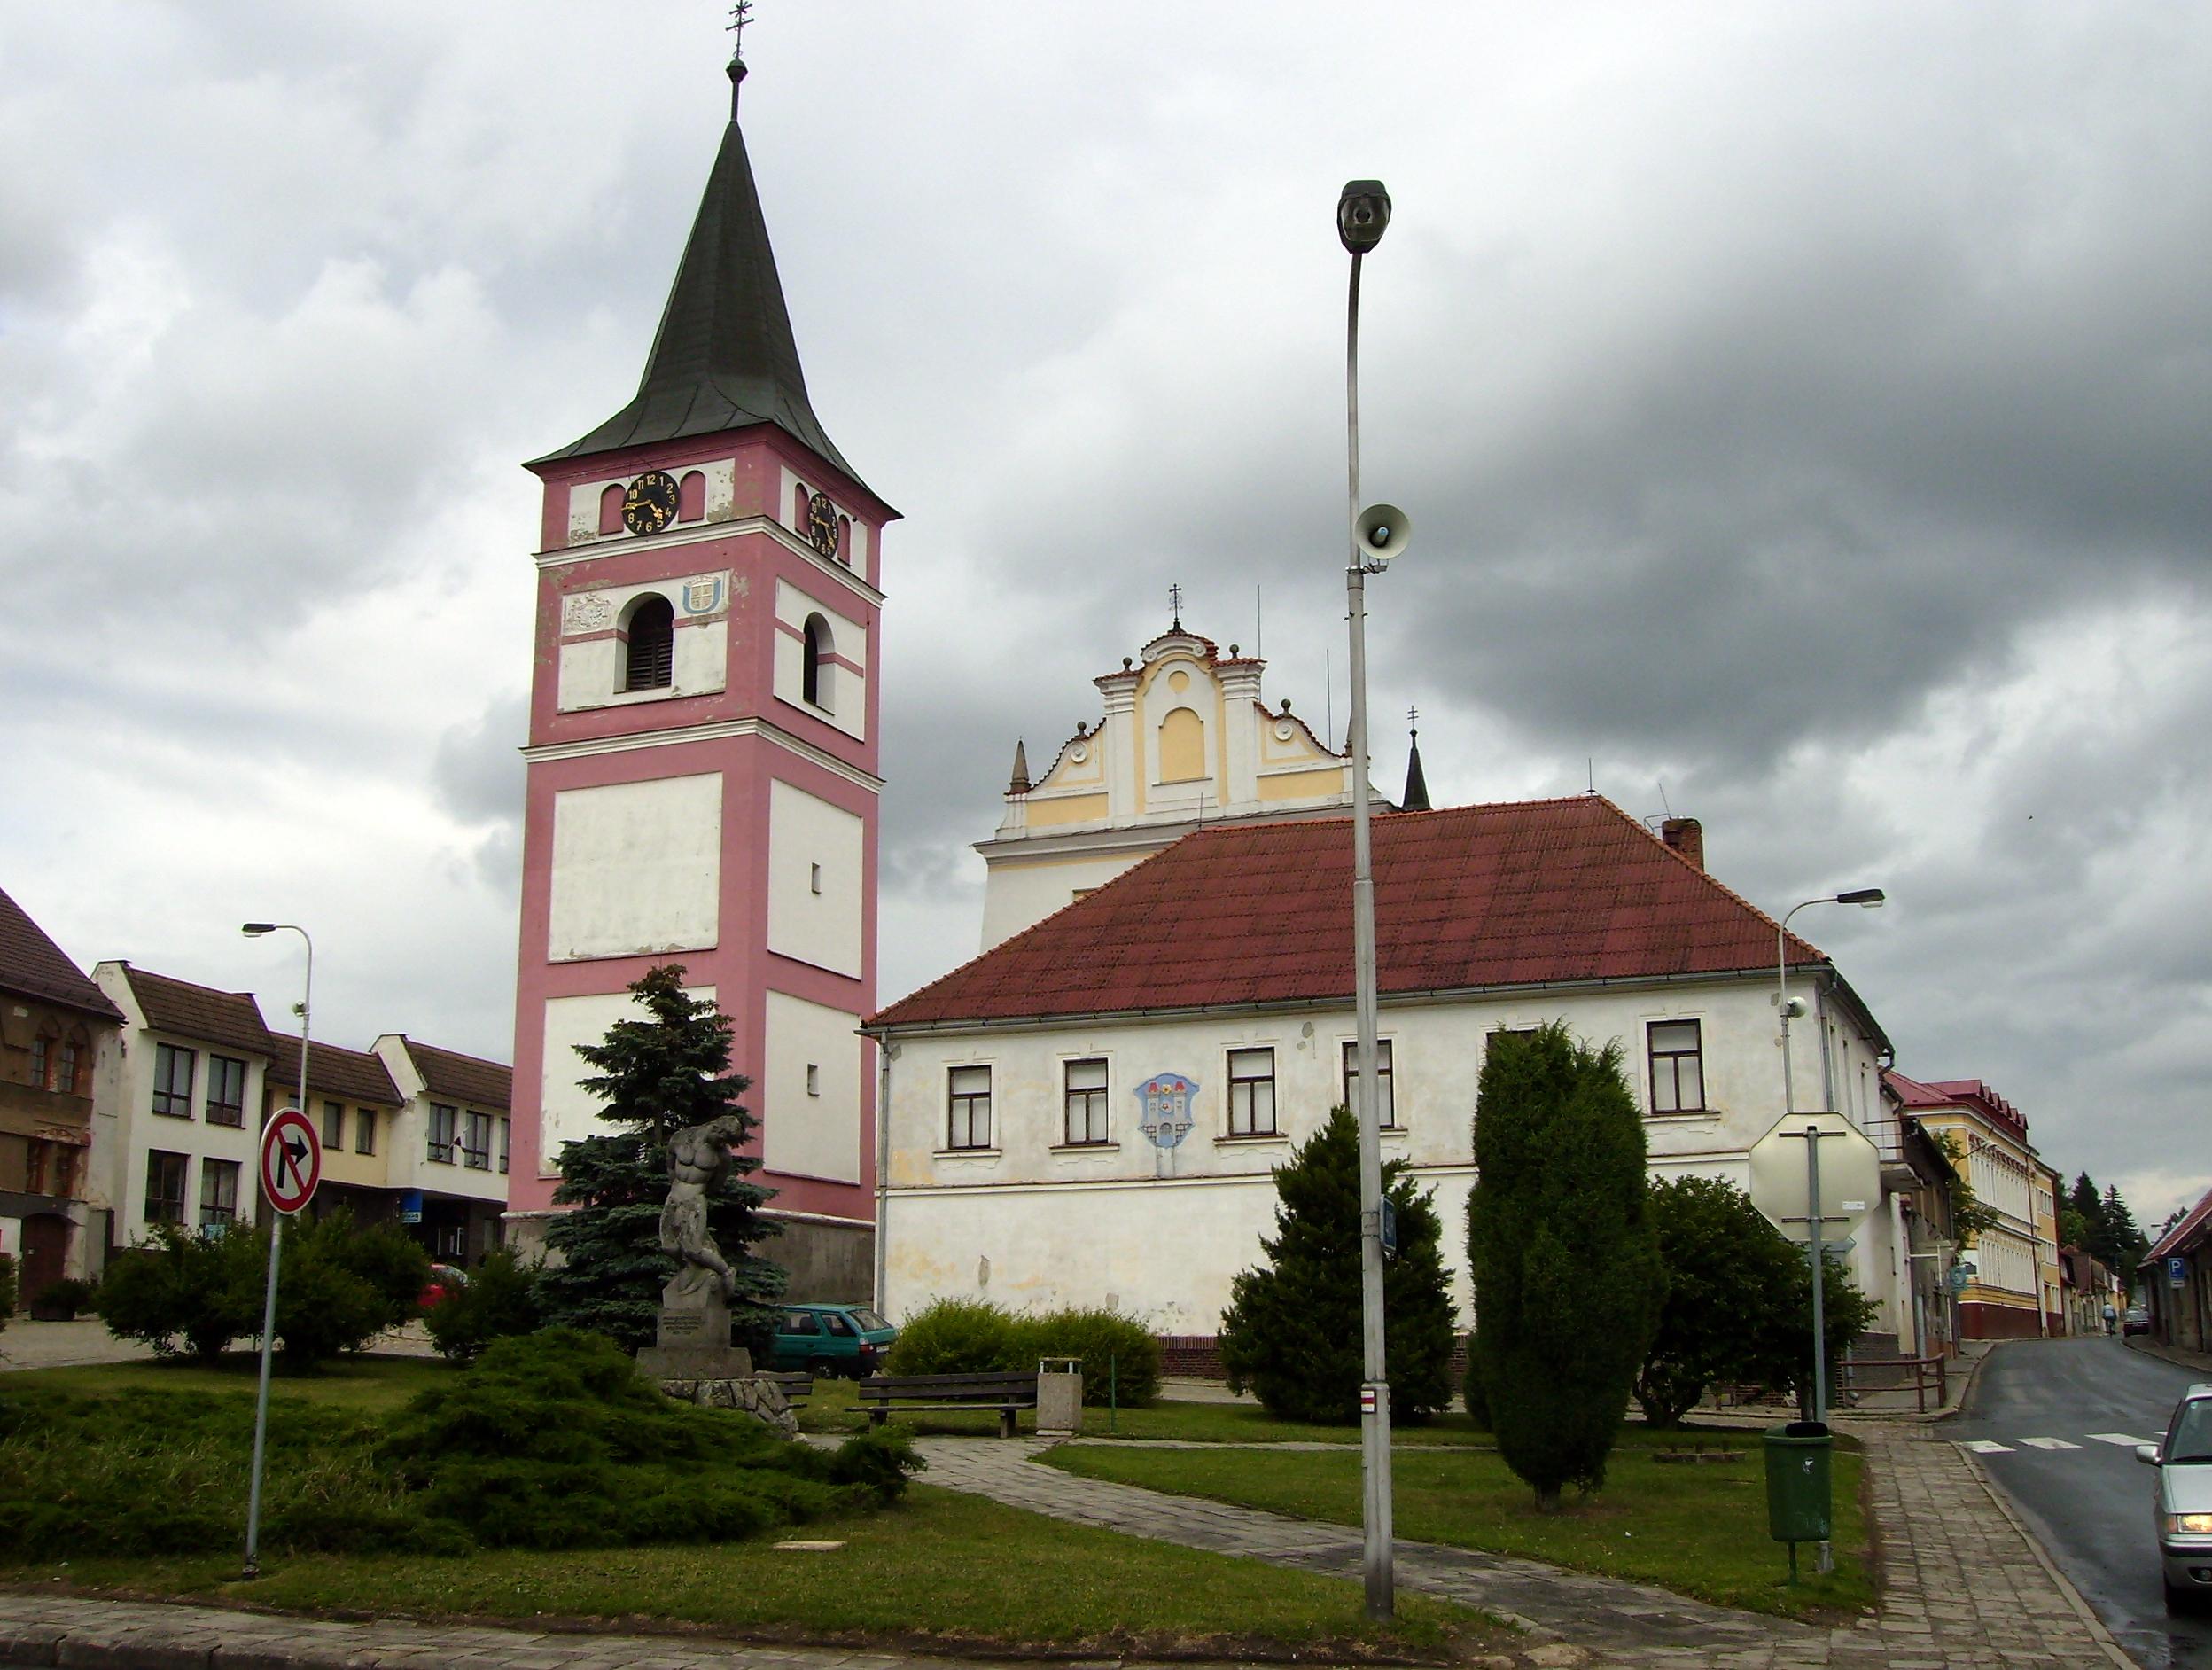 Flirtovn - on hled ji v okrese Brno - ernovice - Annonce